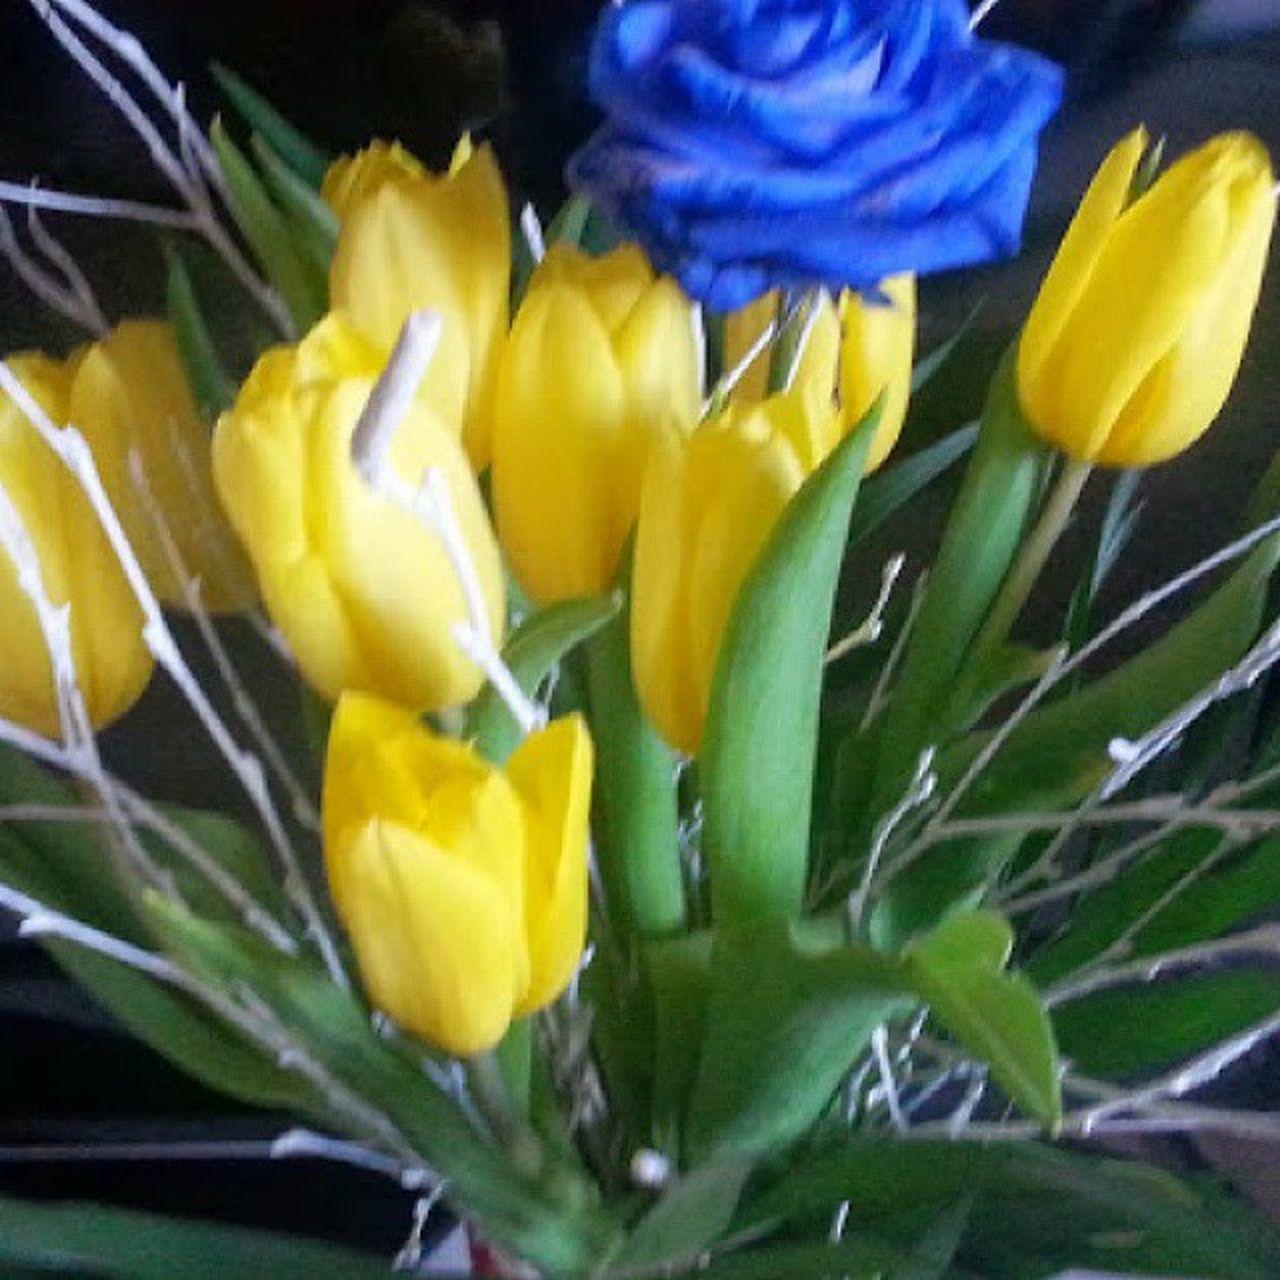 Blaurose Tulpen голубая_роза желтыетюльпаны